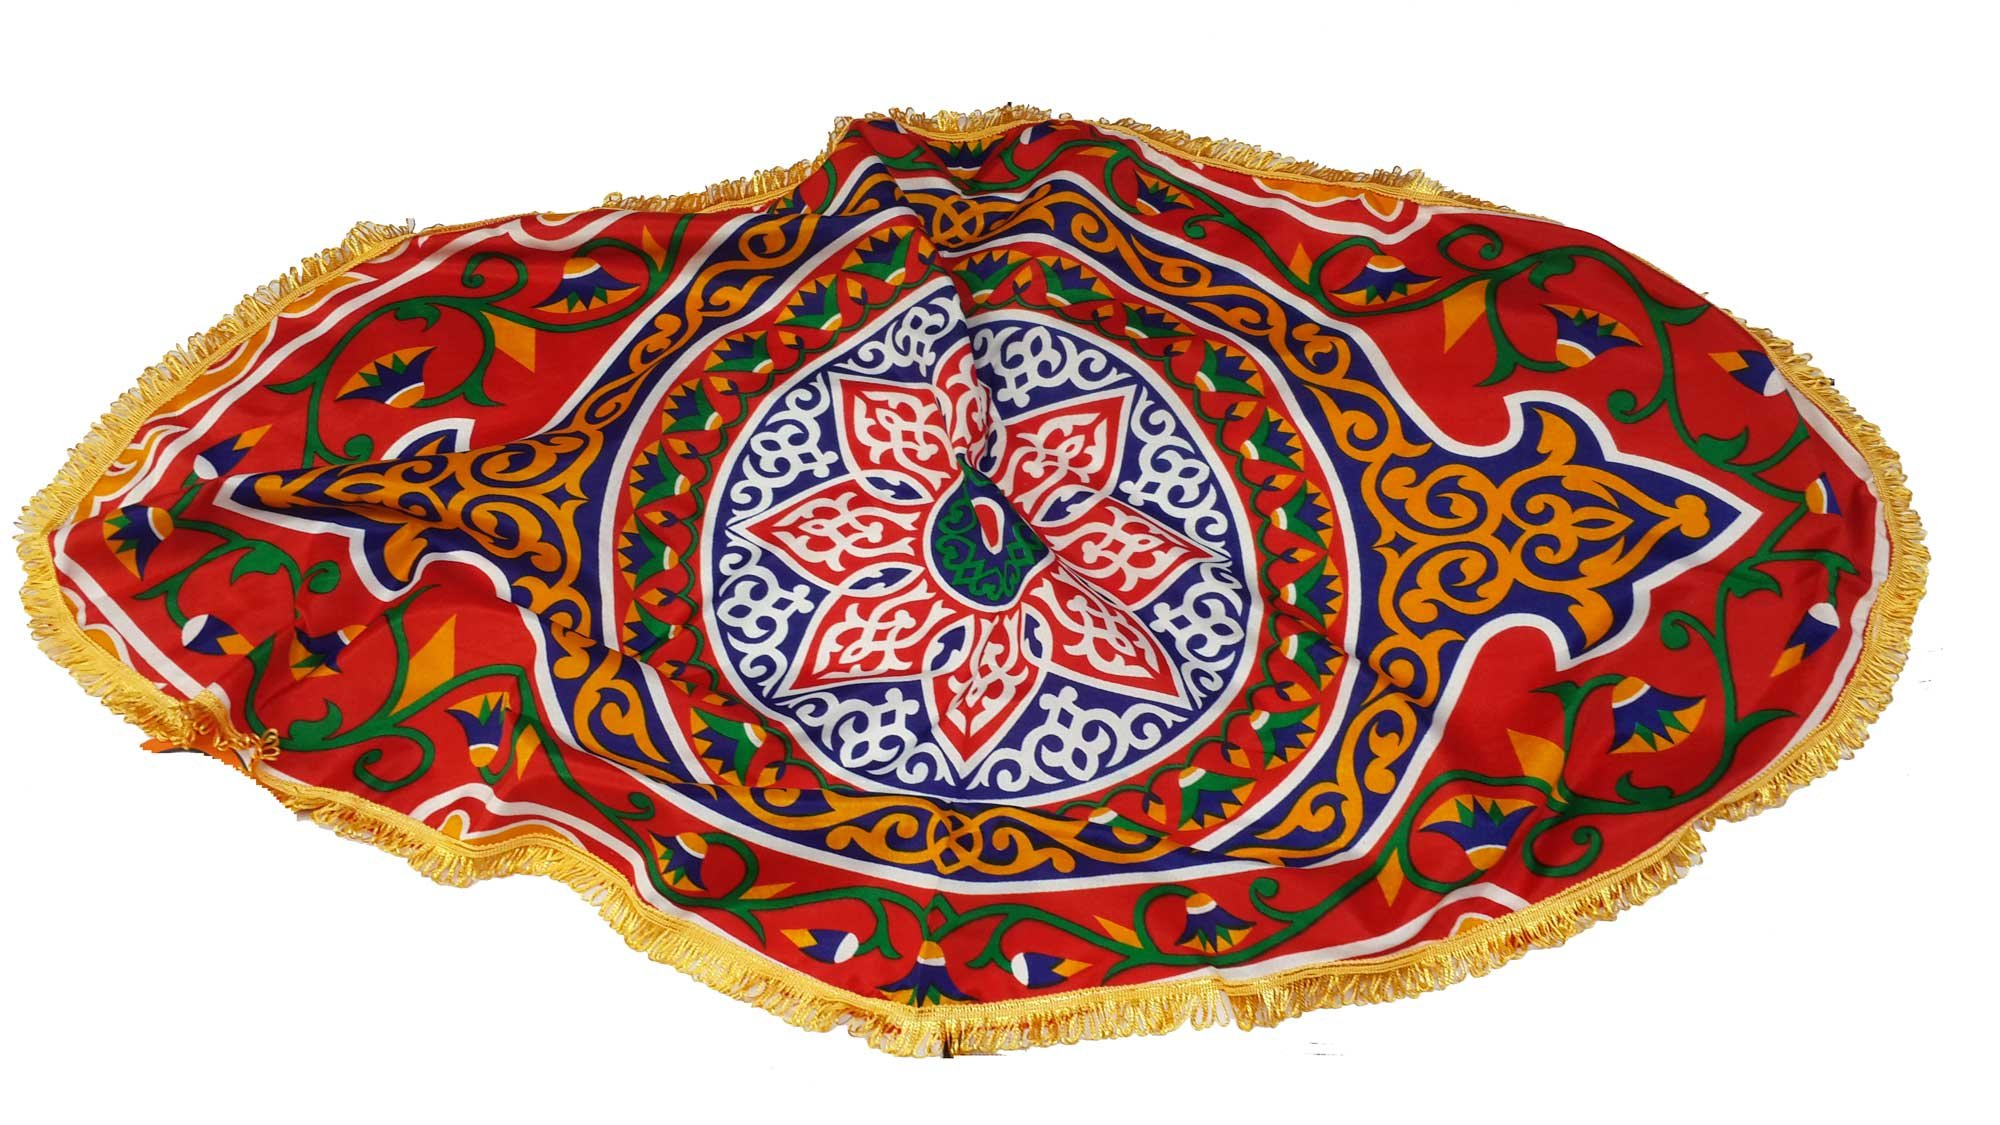 Egypt gift shops Oval Exotic Lotus Traditional Arabic Textile Sheet Tribal Khayamiya Ramadan Display Showroom Fabric Table Topper Wall Decor Party Cover Fringes